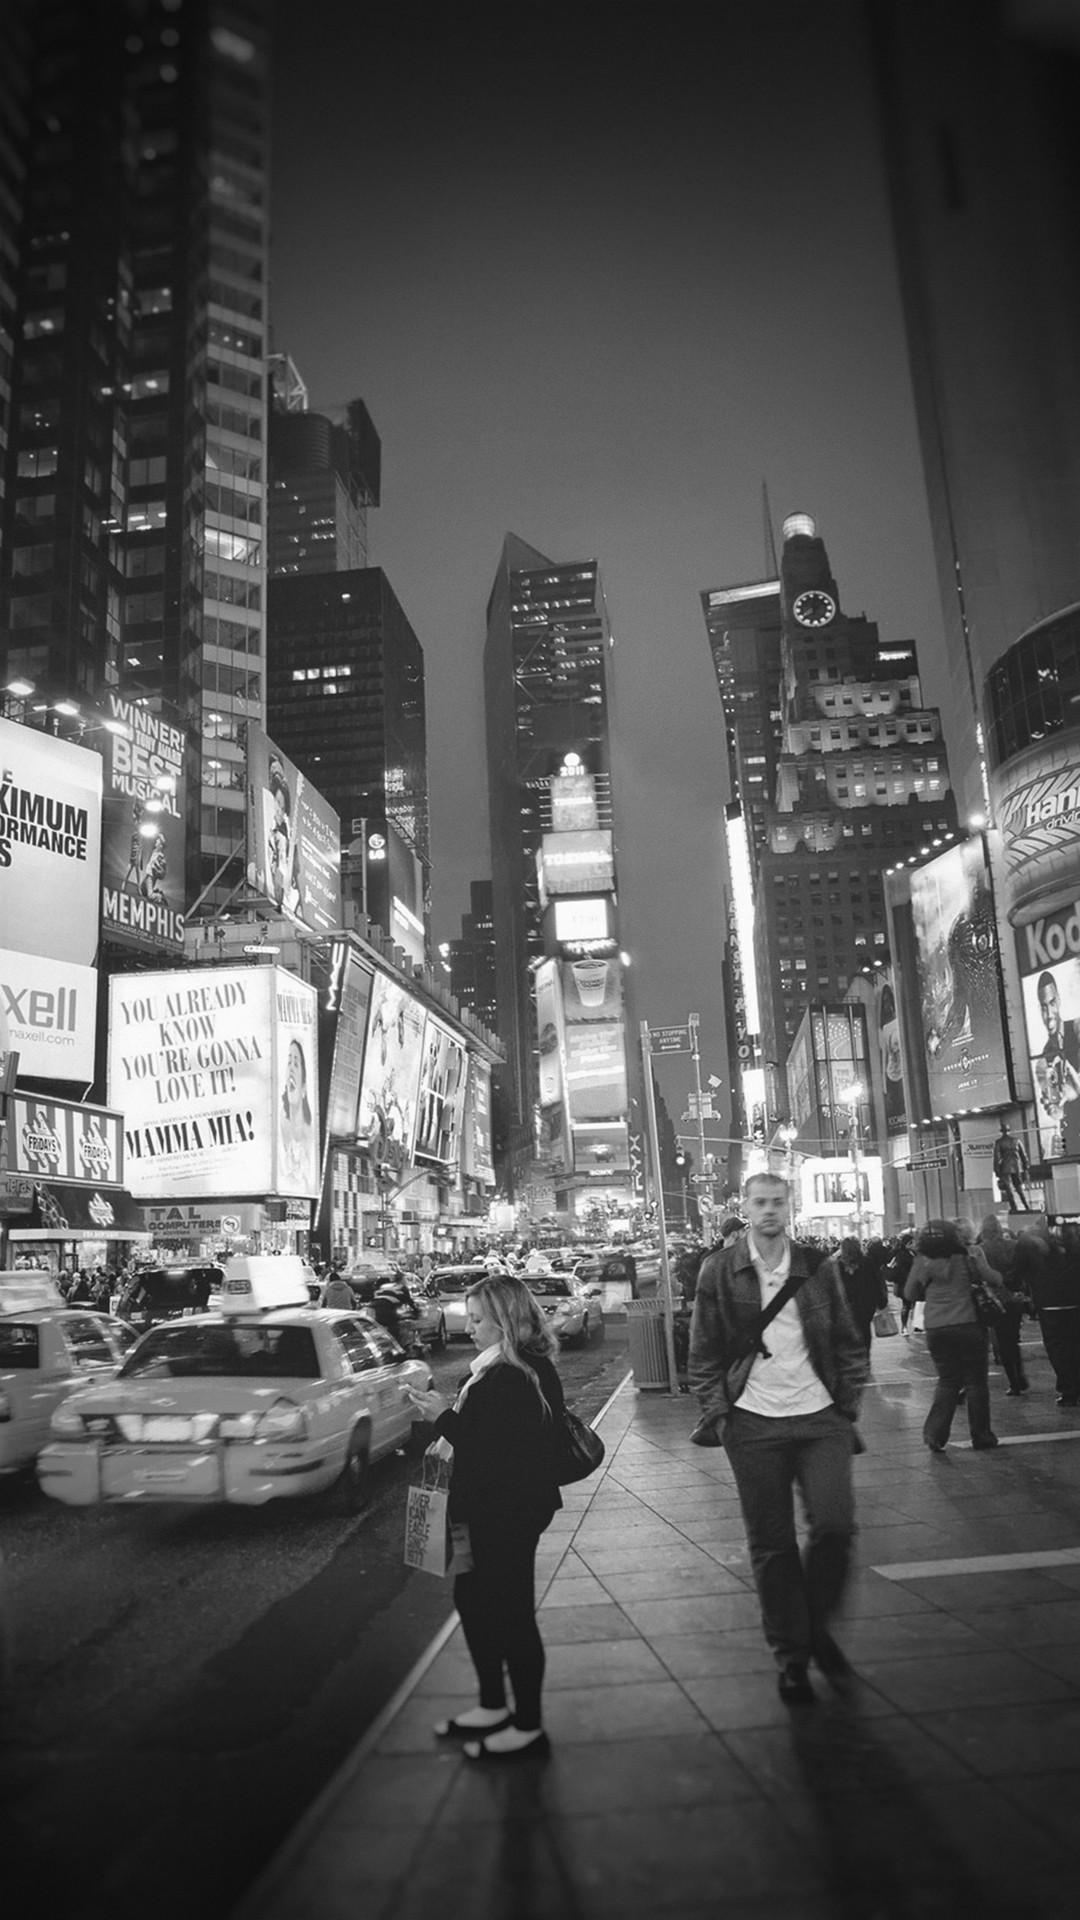 New York Street Night City Dark Vignette #iPhone #7 #wallpaper